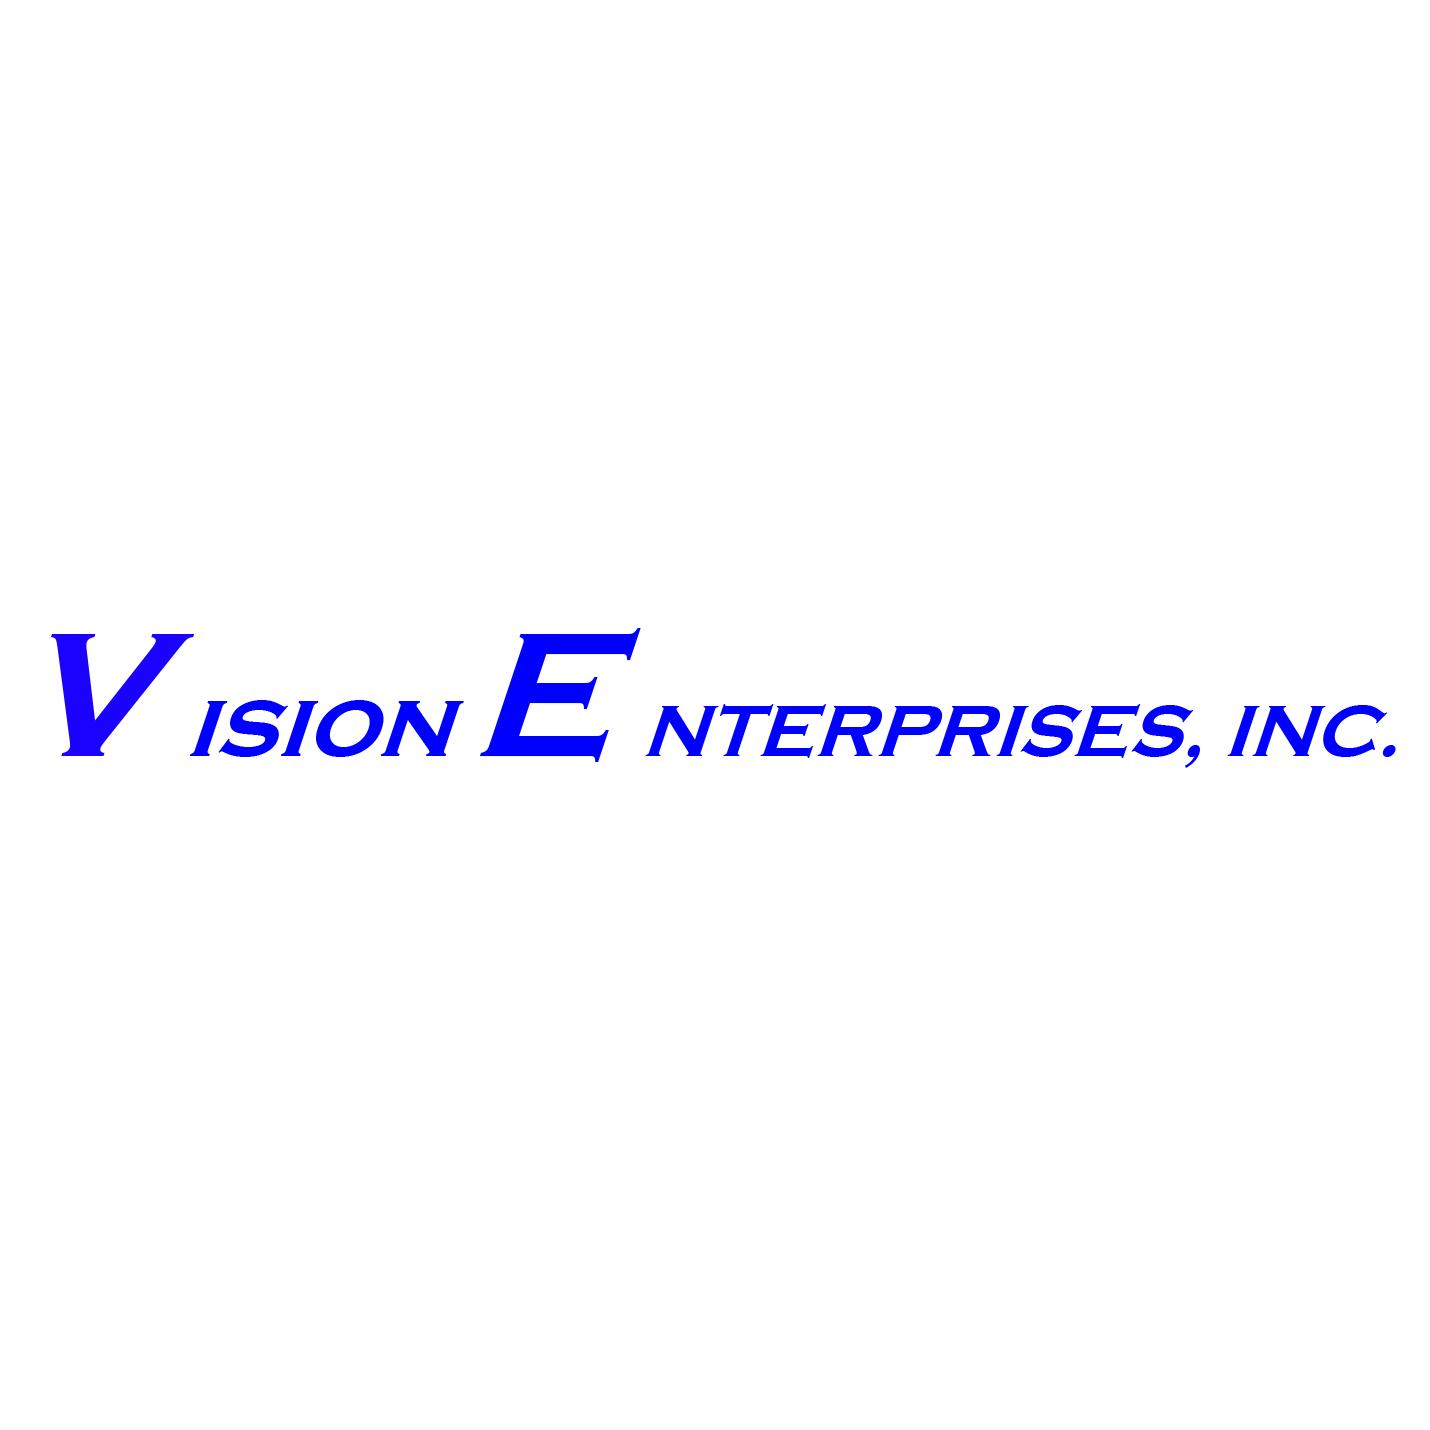 Vision Construction Enterprises, Inc. - Tulsa, OK - Siding Contractors